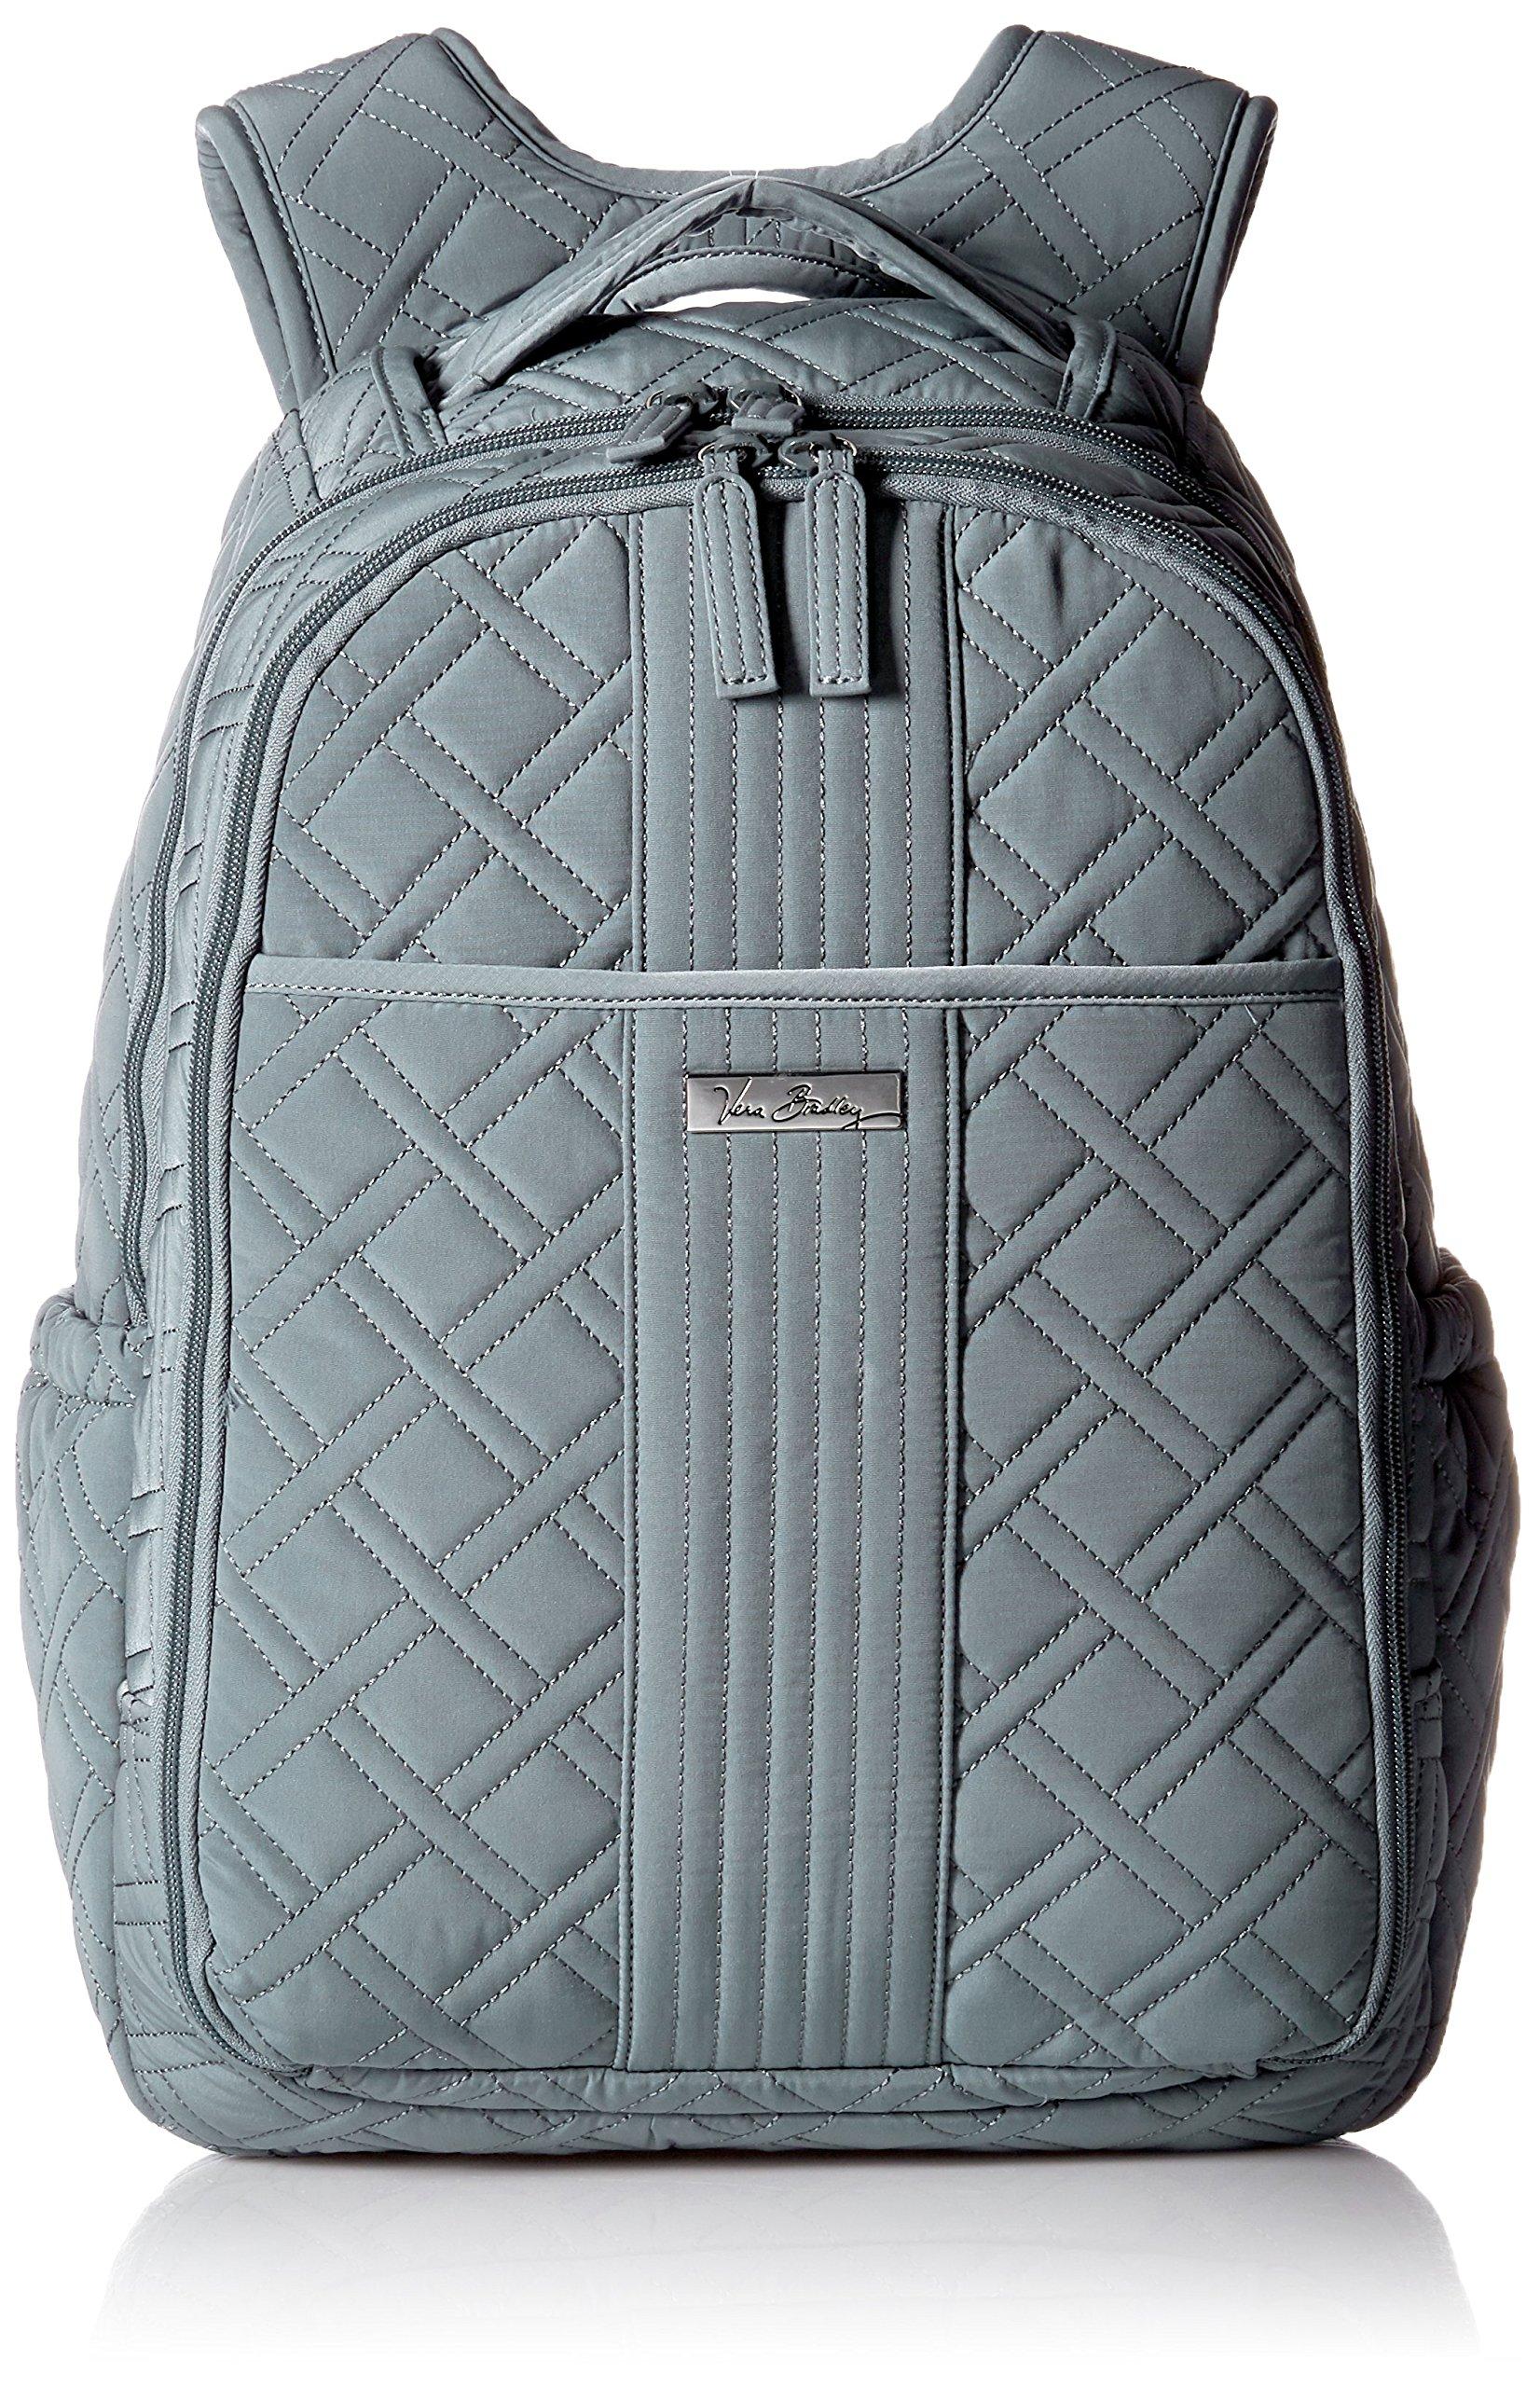 Vera Bradley Women's Backpack Baby Bag, Charcoal